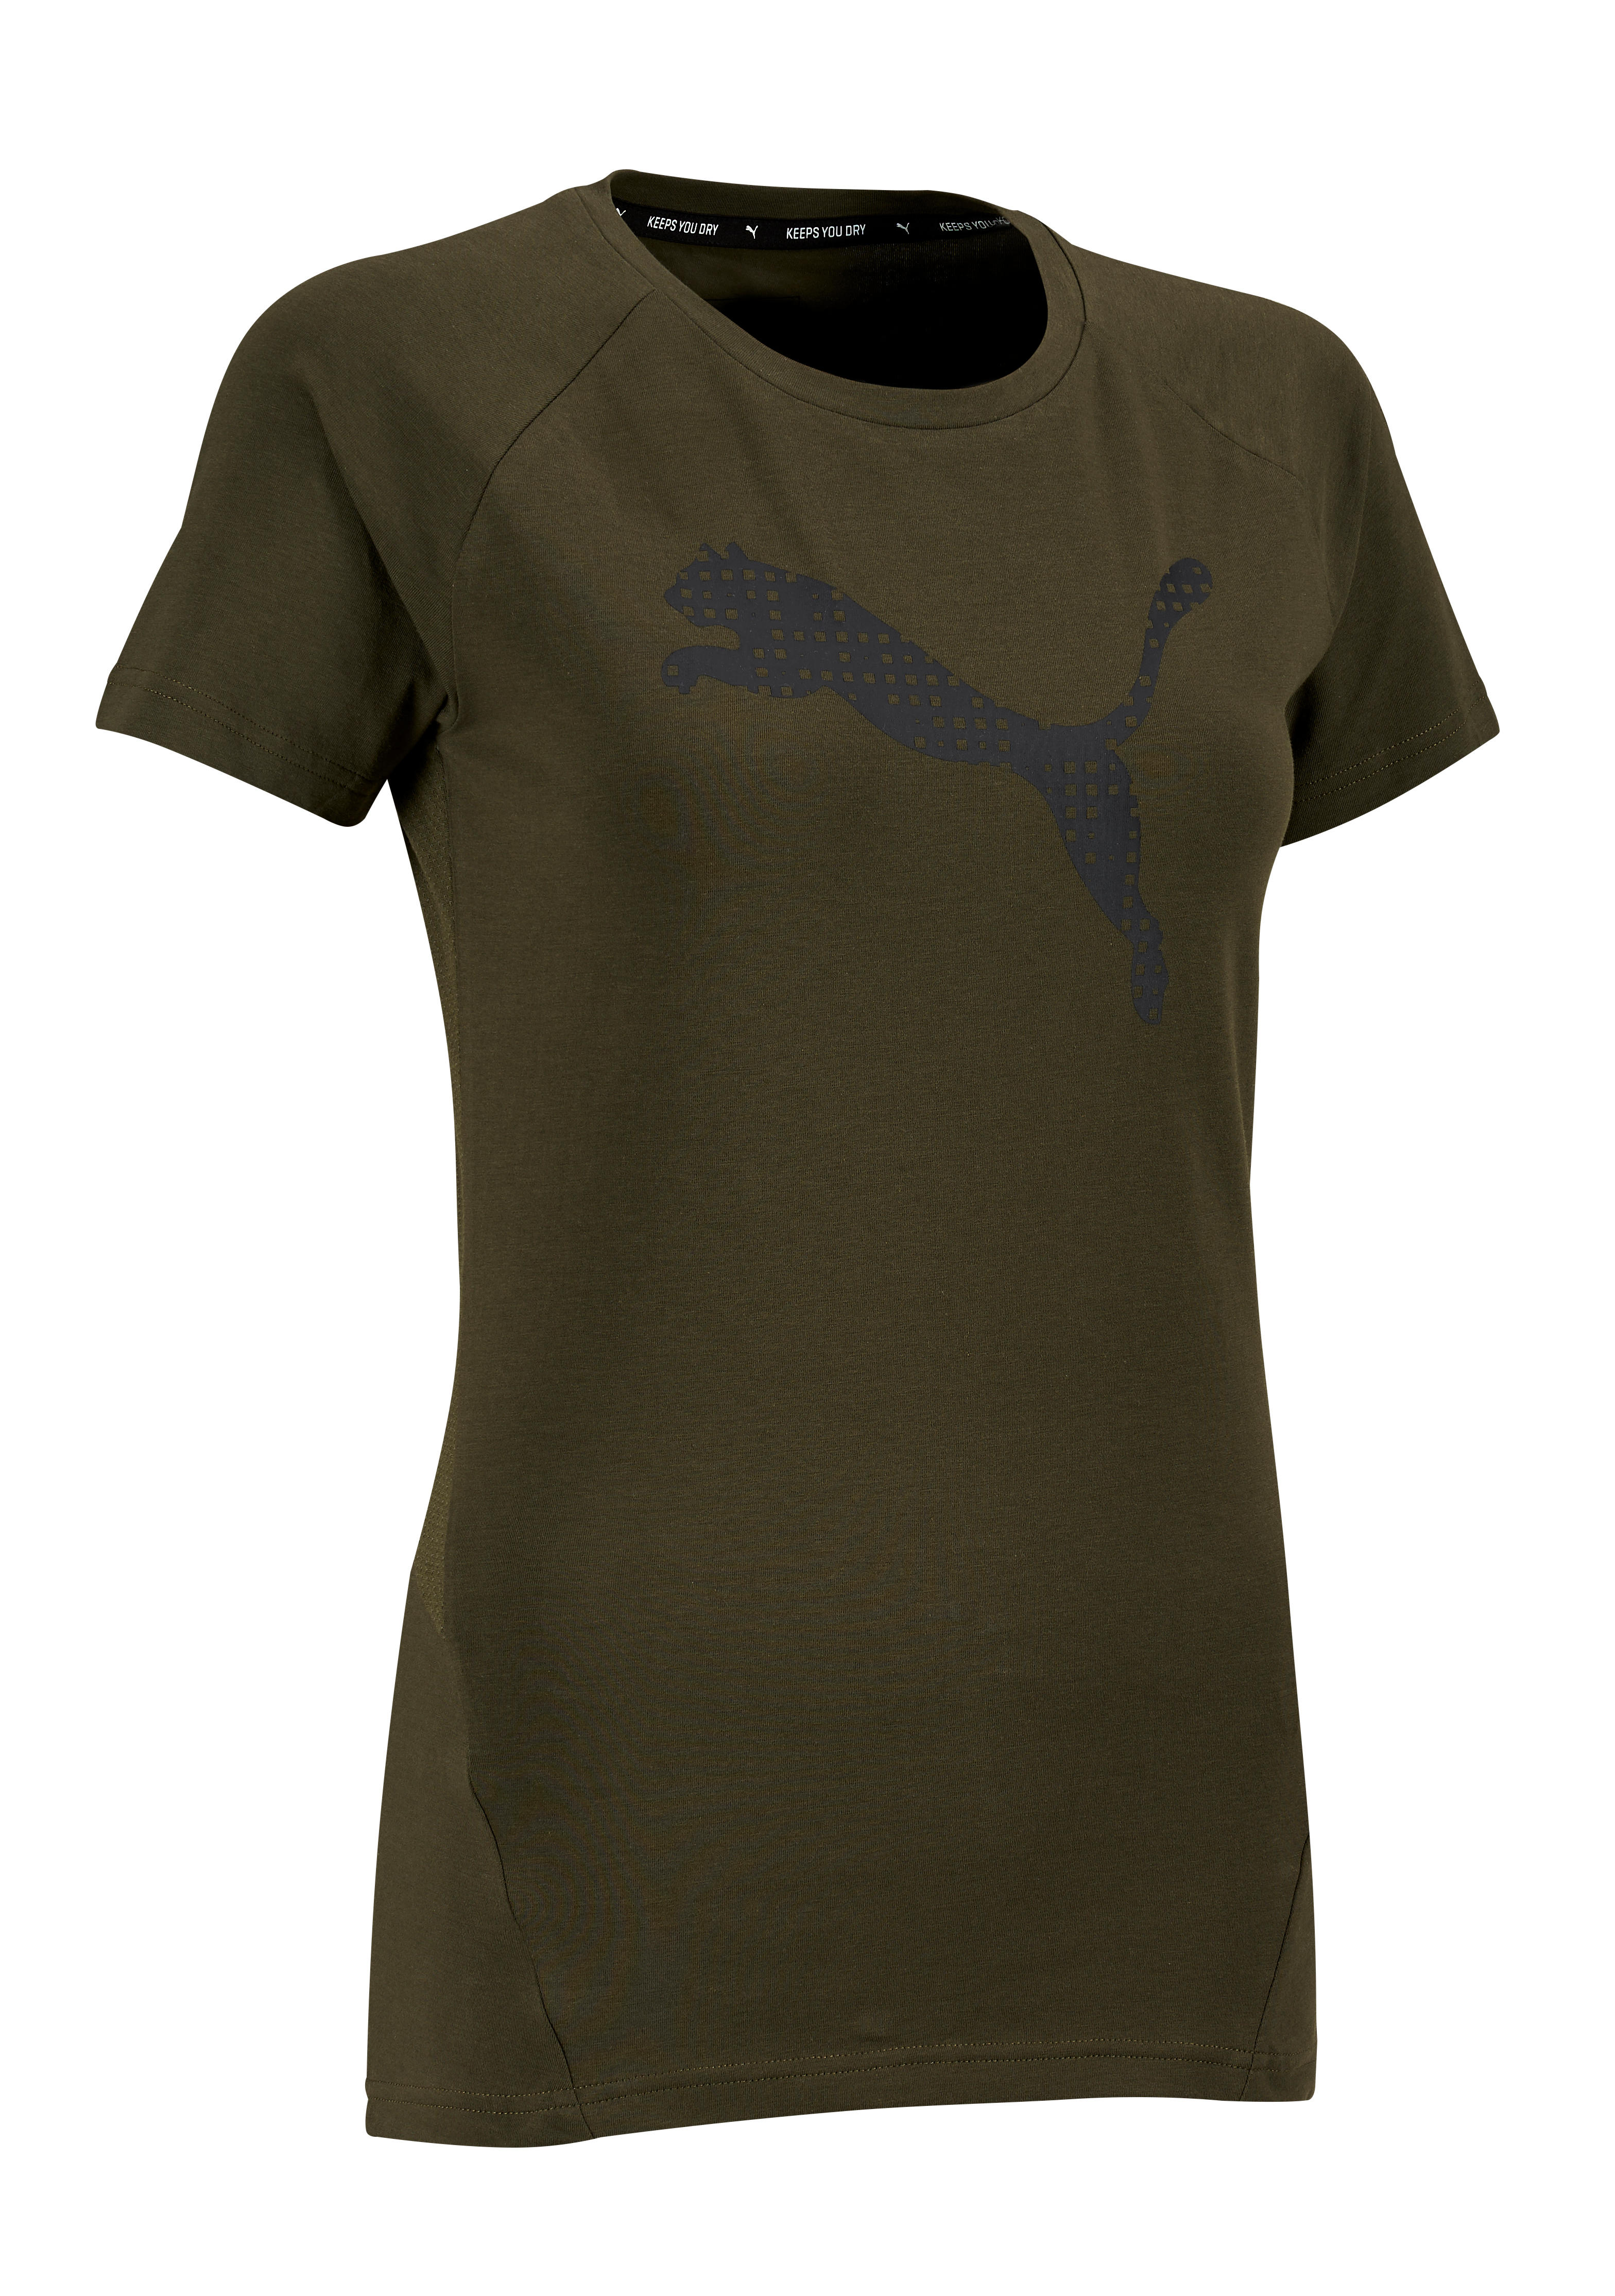 Gym Femme Shirt Puma T 100 Kaki Stretching PXZuOki